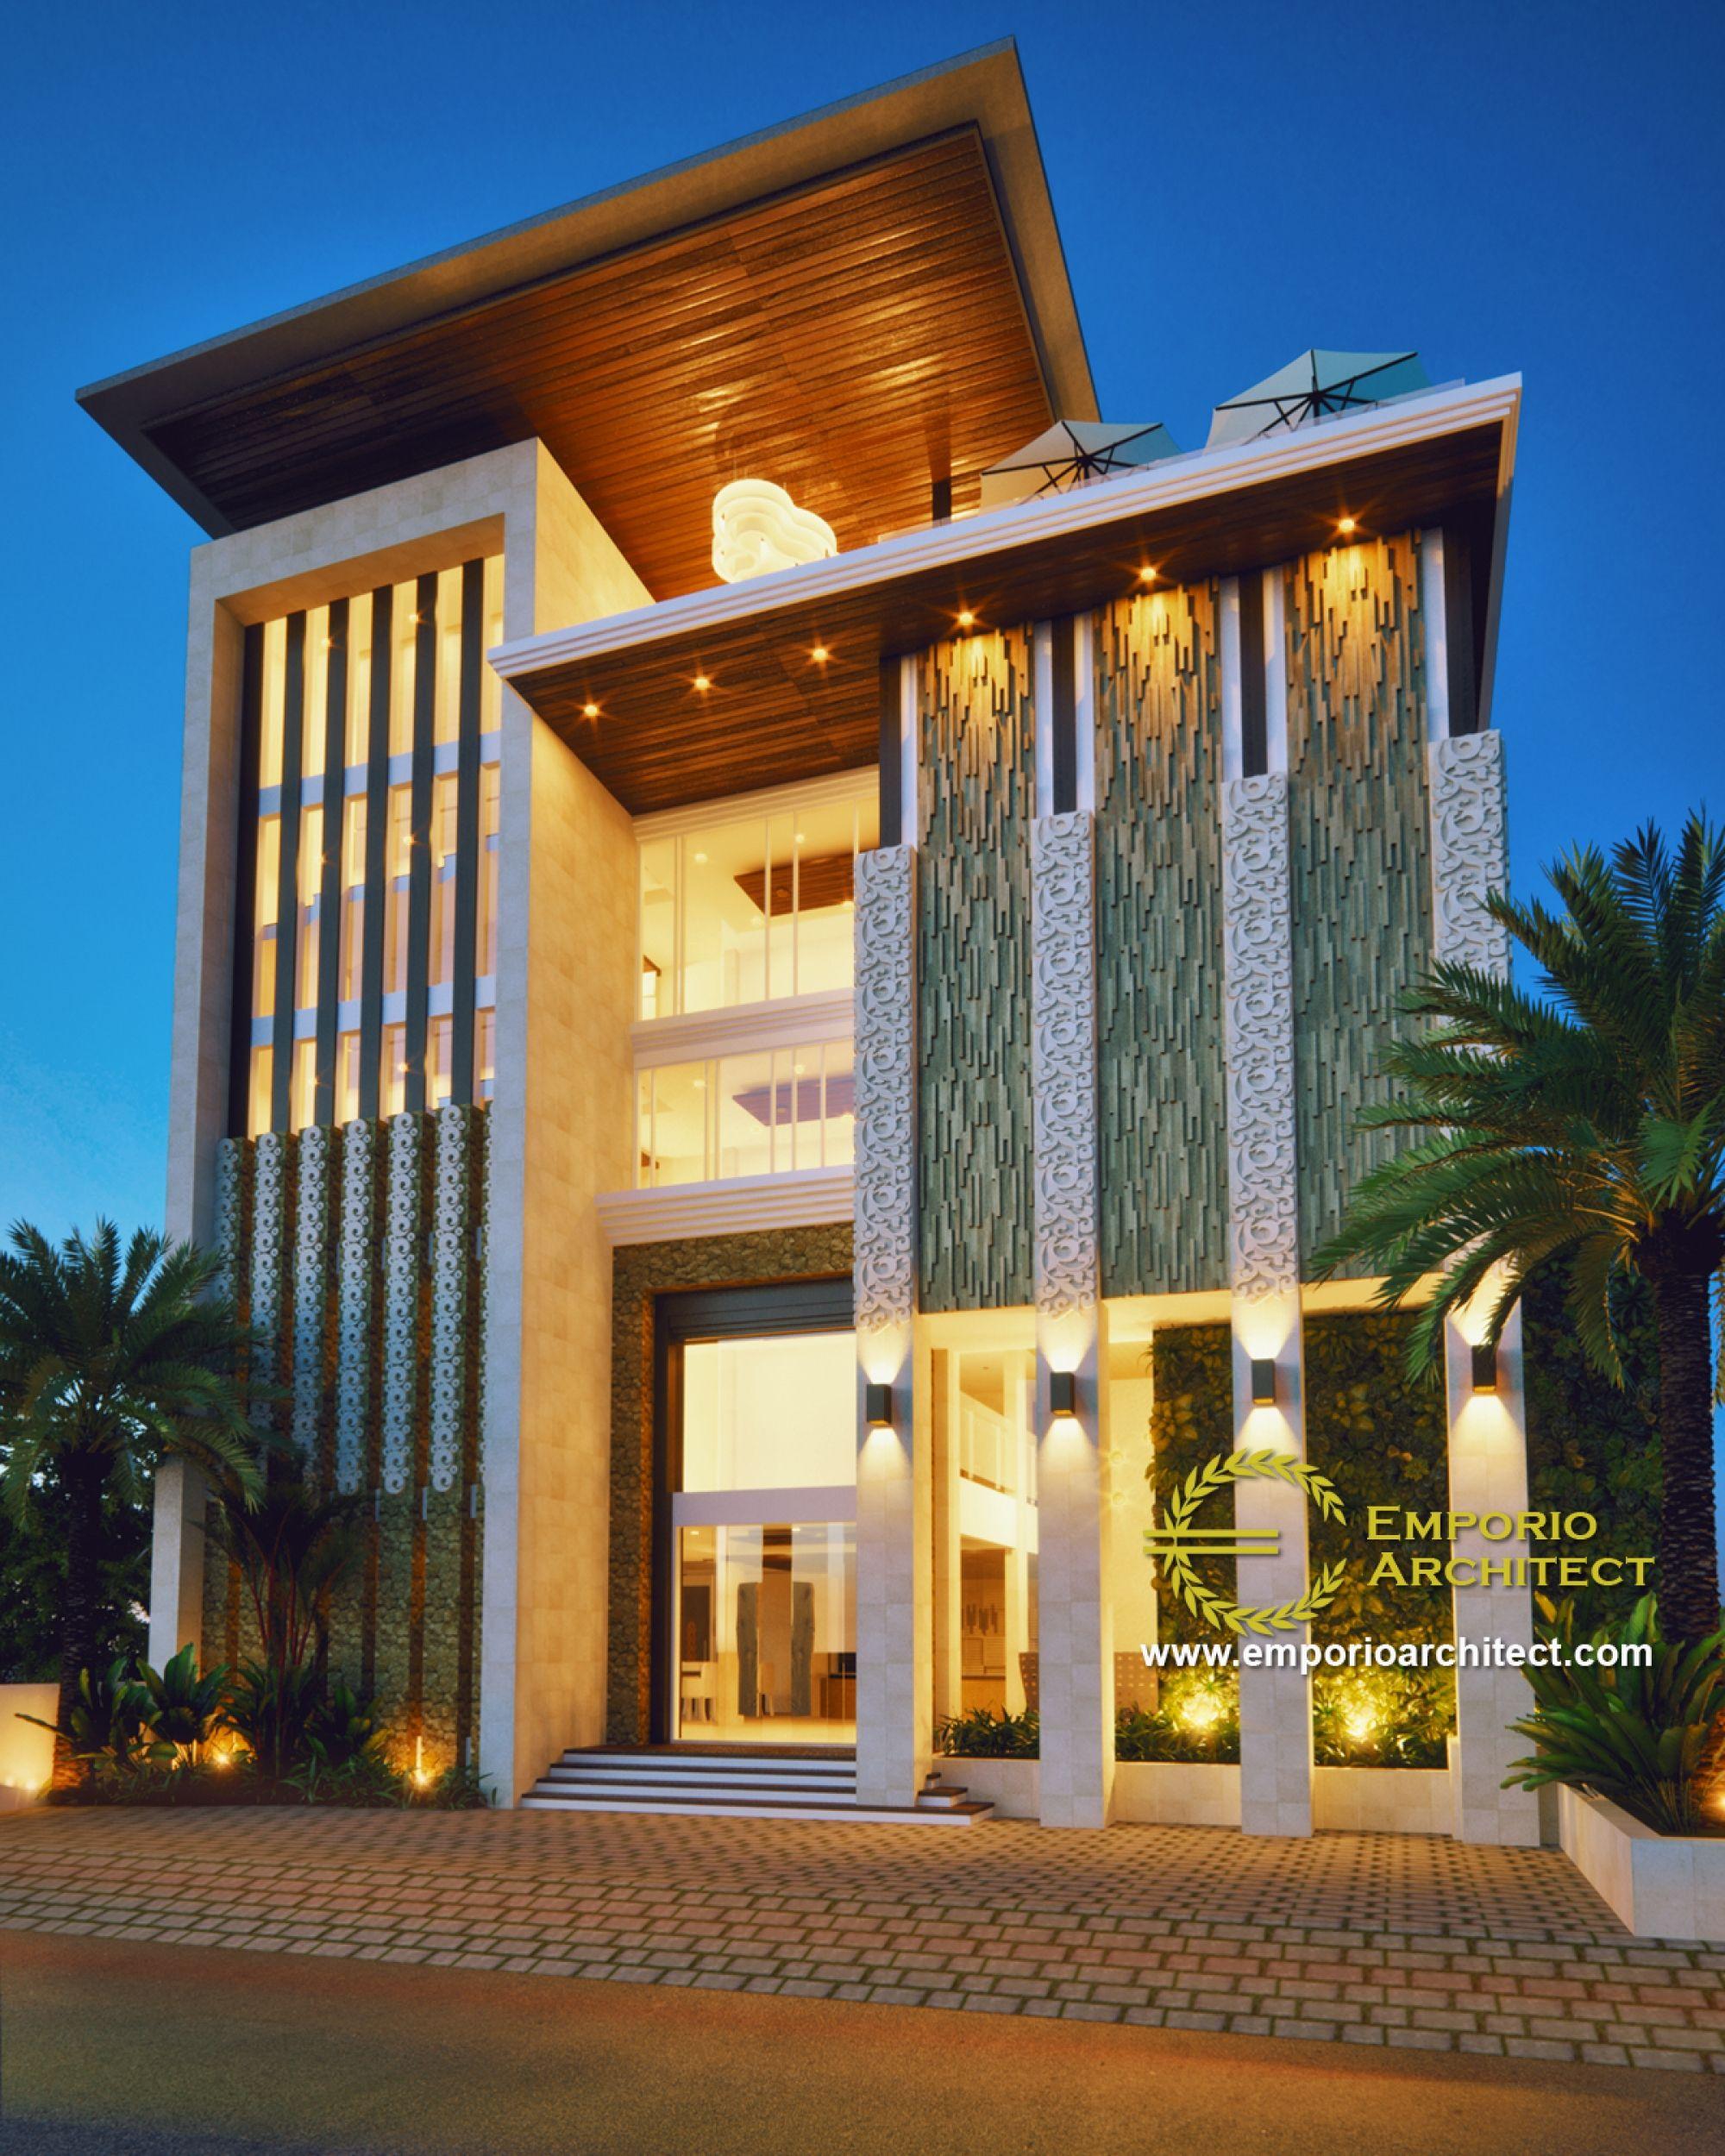 Desain hotel ar rayyan bali di desainbangunan jasaarsitek arsitek also pin by habib khusairi abbas on house design in pinterest rh